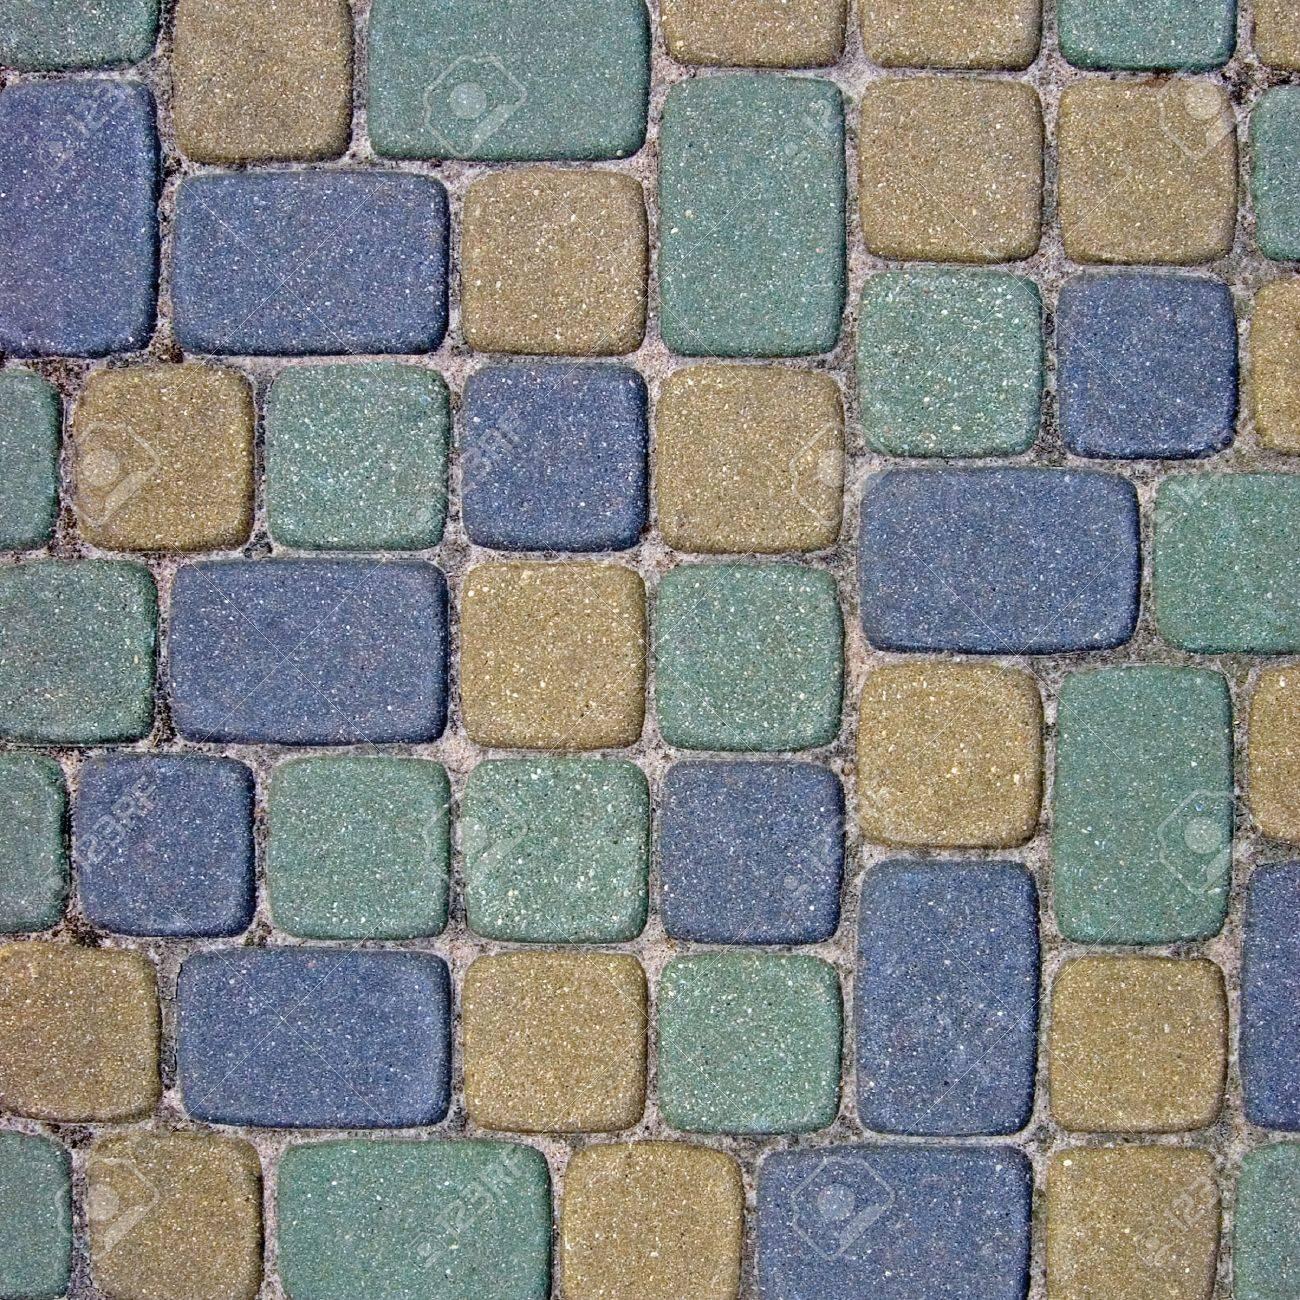 Cobblestone Texture Background Closeup, colorful green, yellow, blue, tan, grey, gray, beige ashlar Stock Photo - 9584310